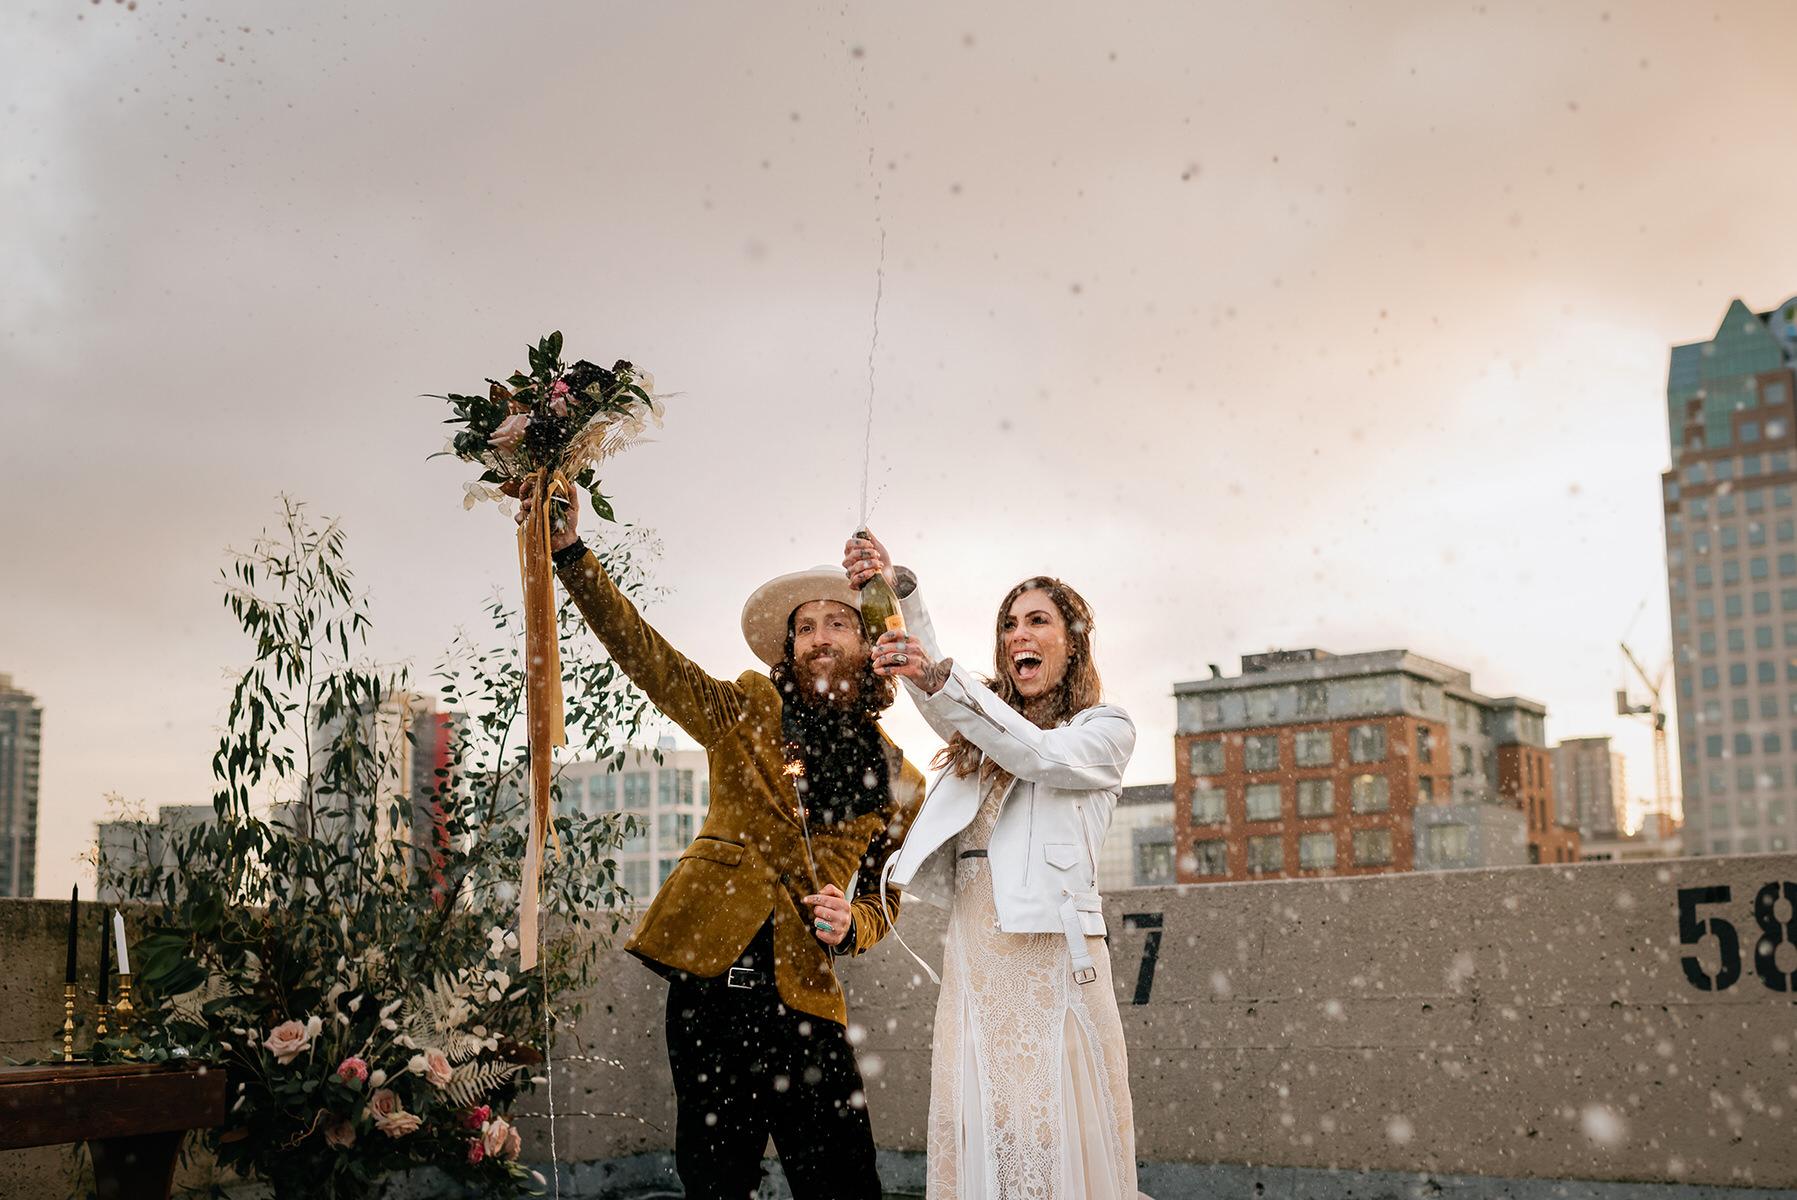 Leanne Sim BC wedding photographer